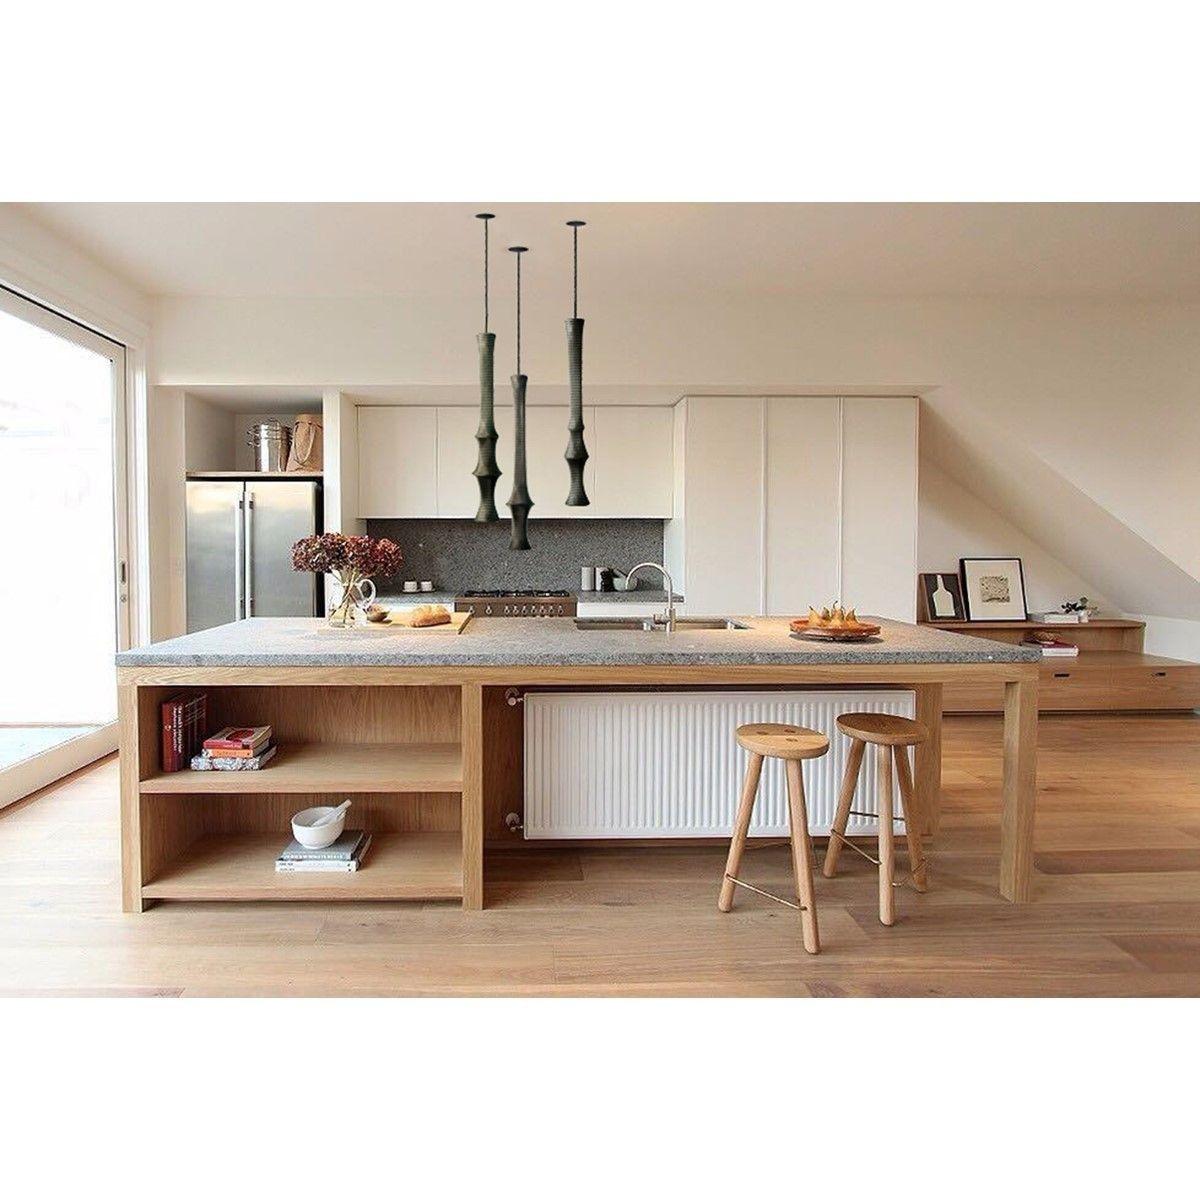 Lampe suspension slim black 3 ilot cuisine relooking - Relooking salle a manger rustique ...